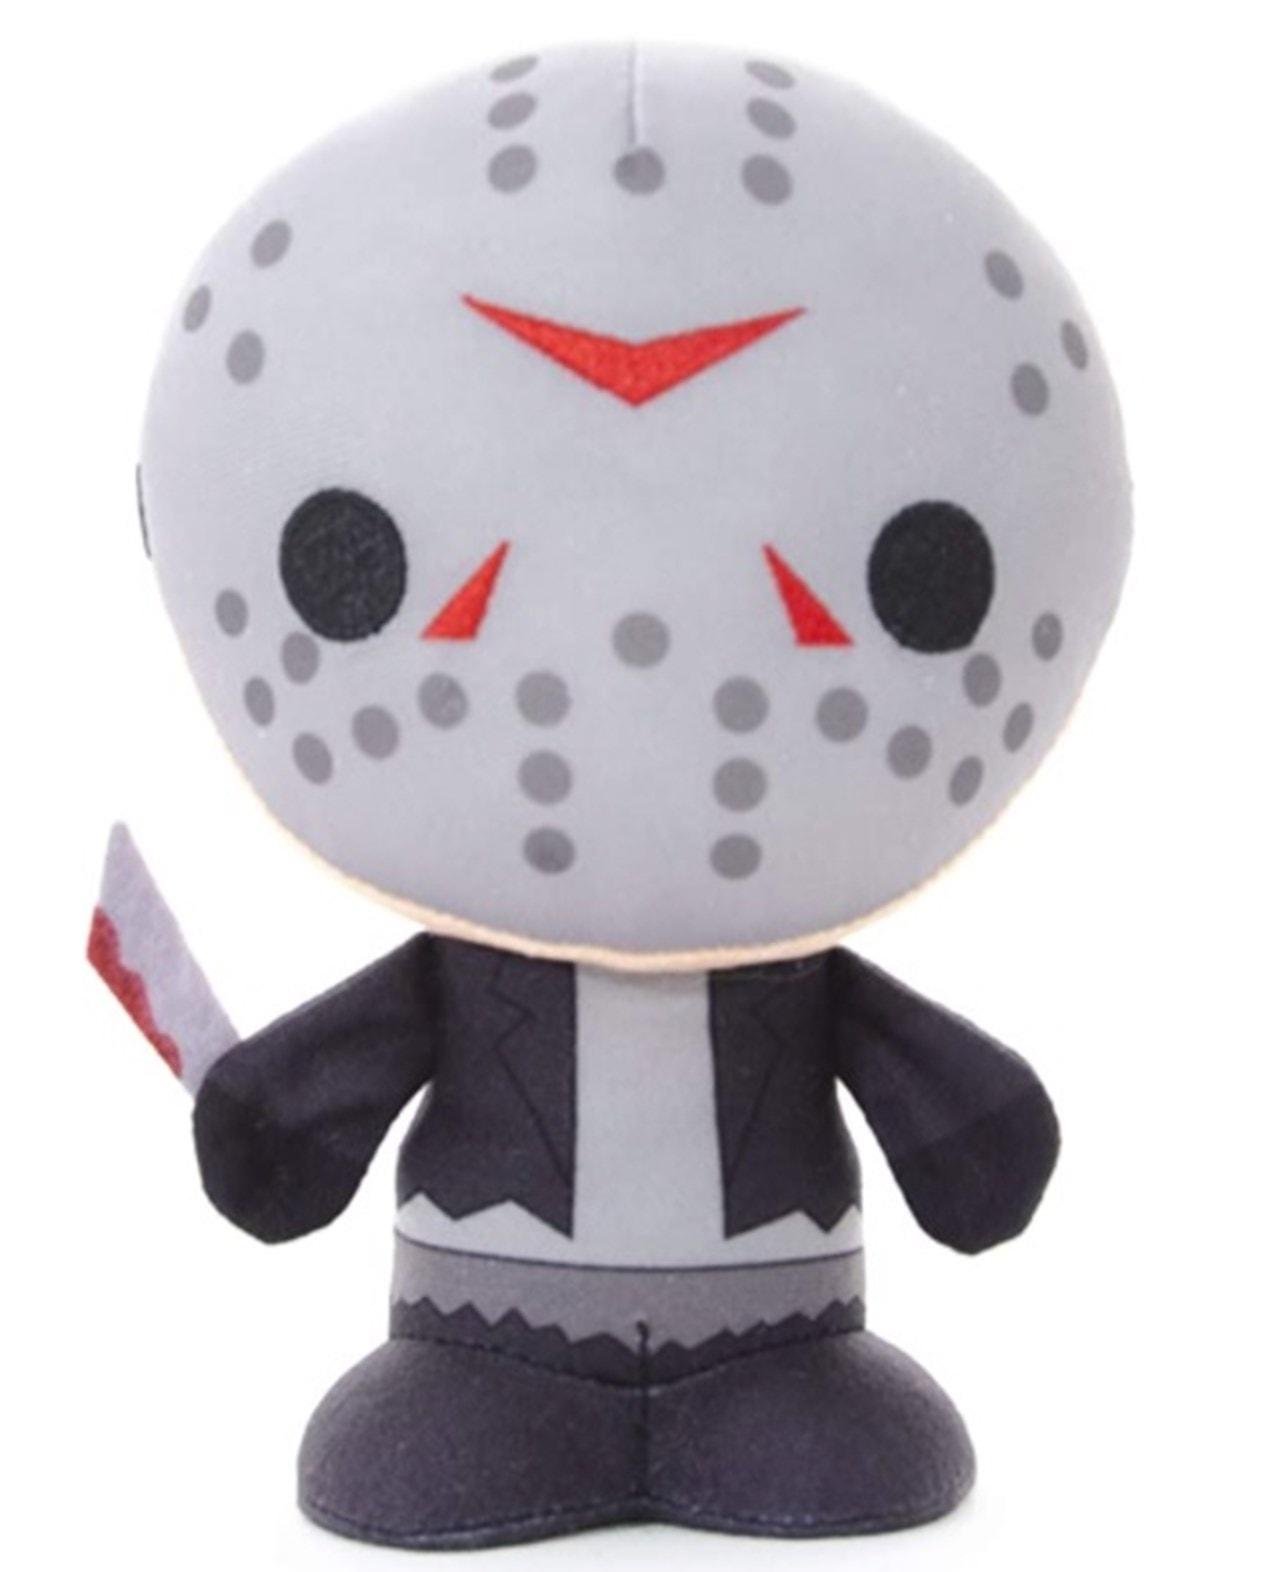 Jason: Friday 13th Plush Toy - 1